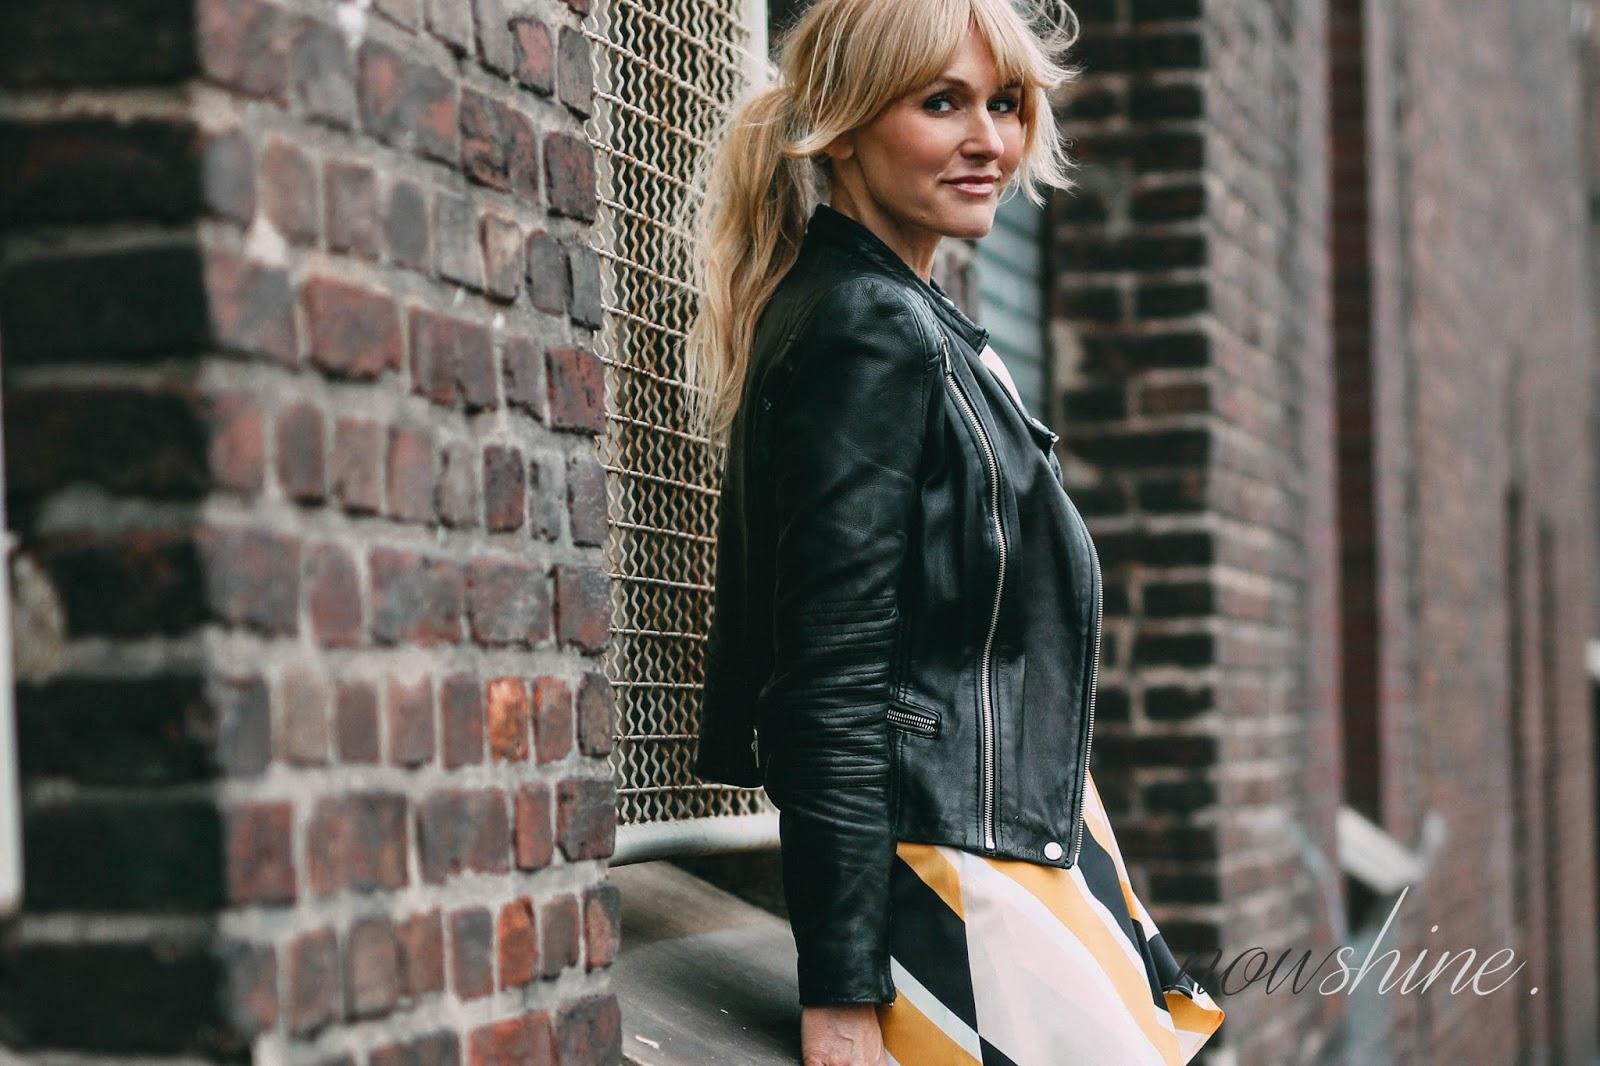 nowshine-outfit-fuer-den-osterbrunch- ue40-mode ue40-blog